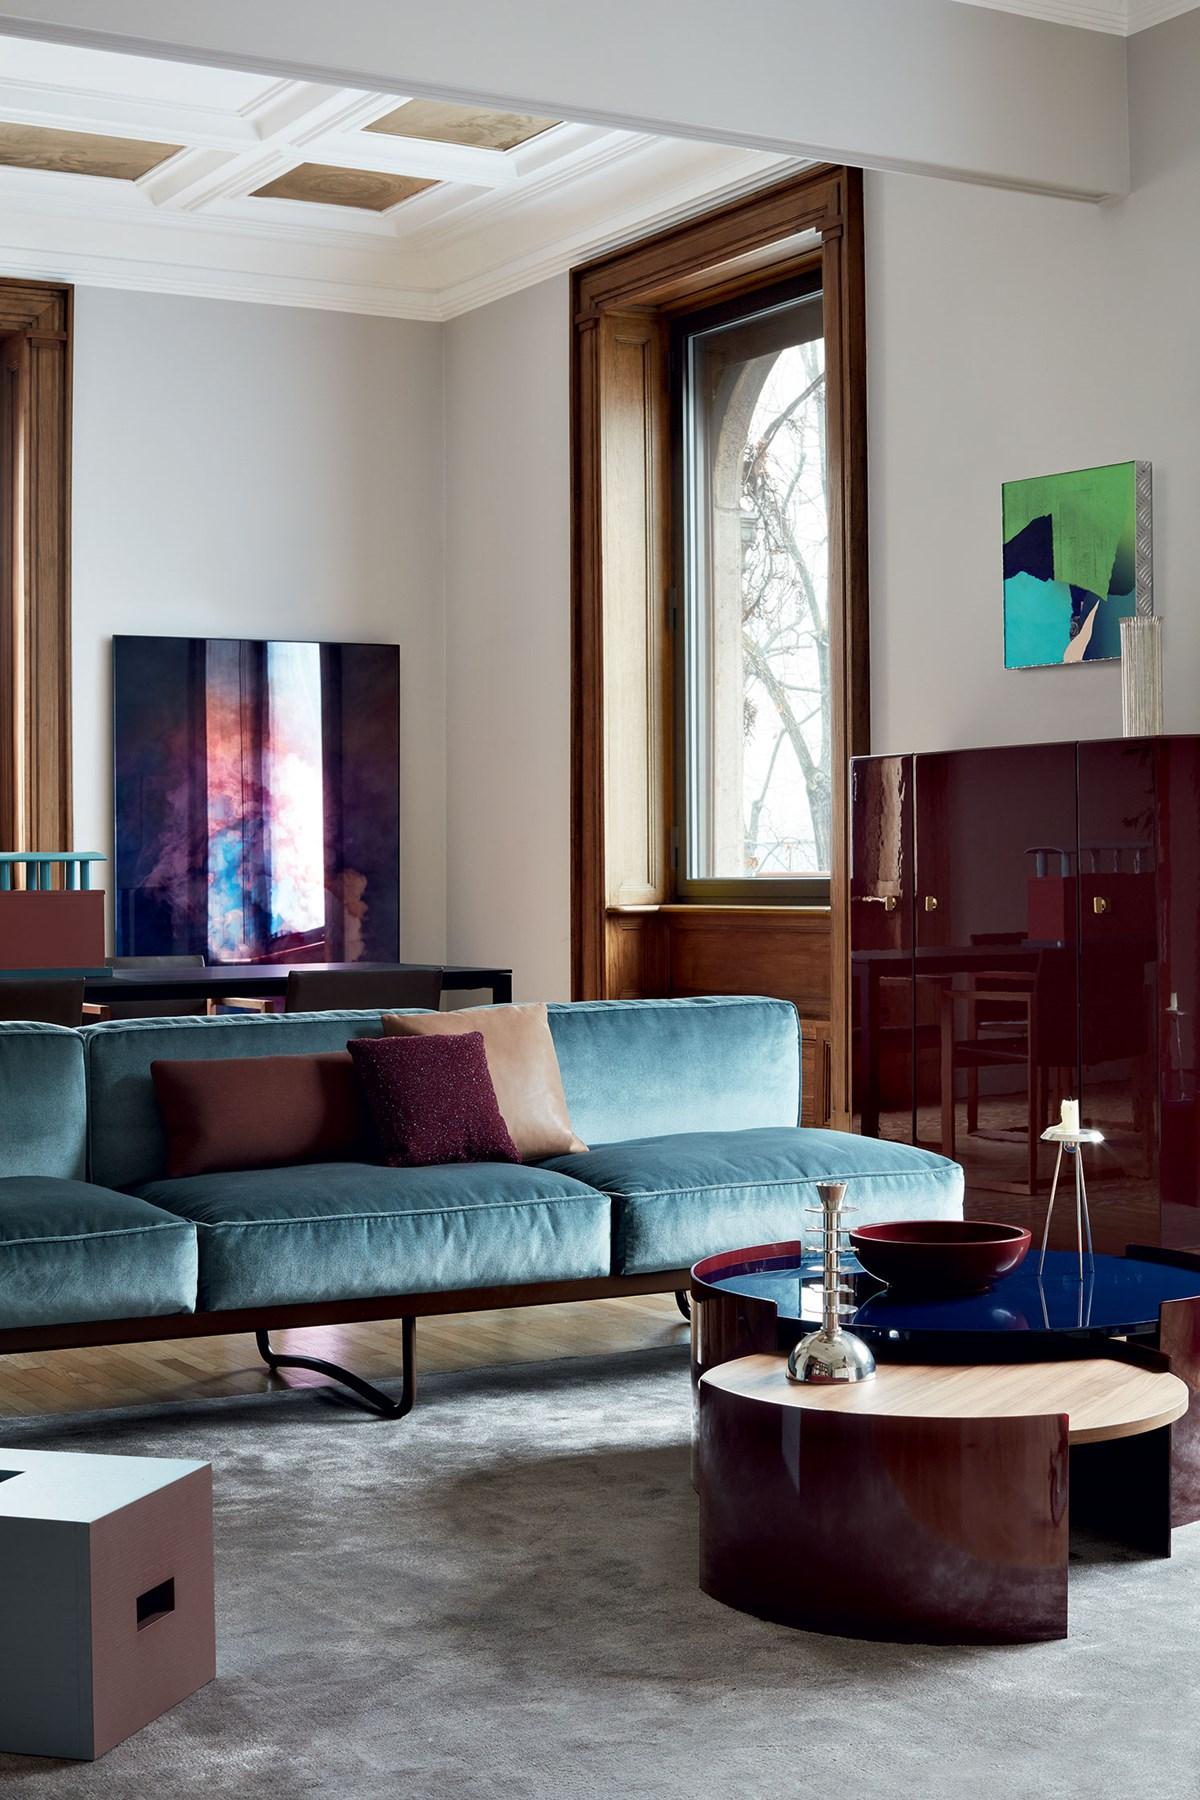 Cassina-Le Corbusier-Pierre Jeanneret-Charlotte-Perriand-LC5-Sofa-Matisse-5